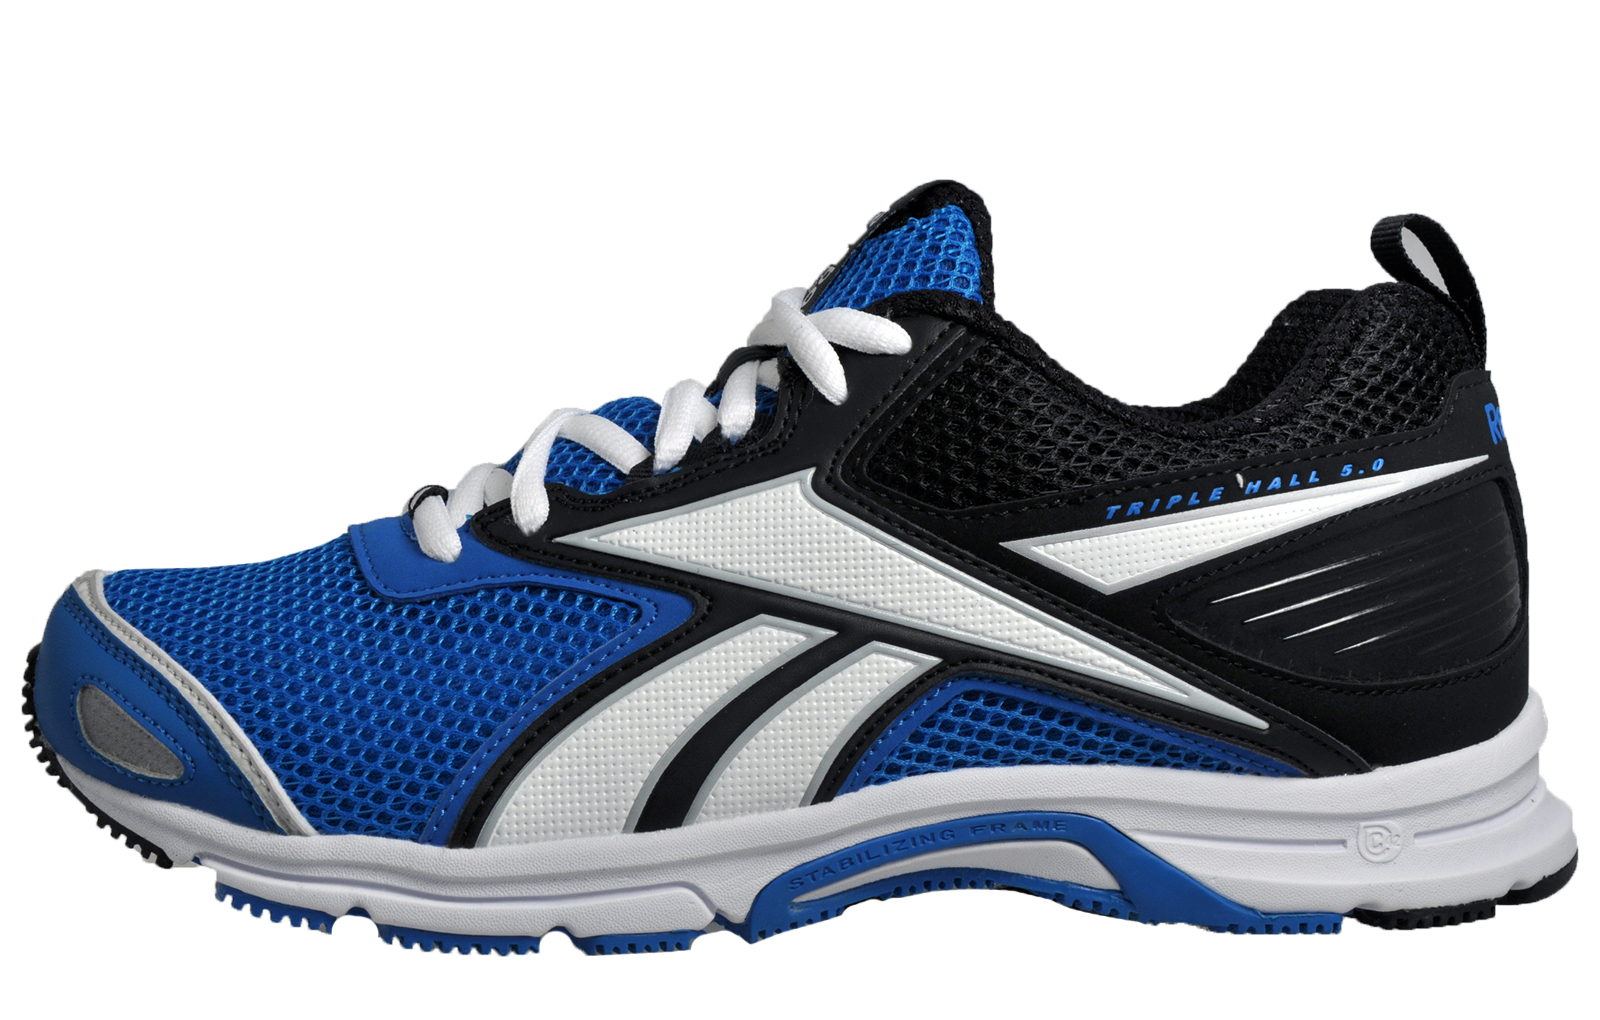 reebok triplehall 5 0 mens running shoes fitness gym